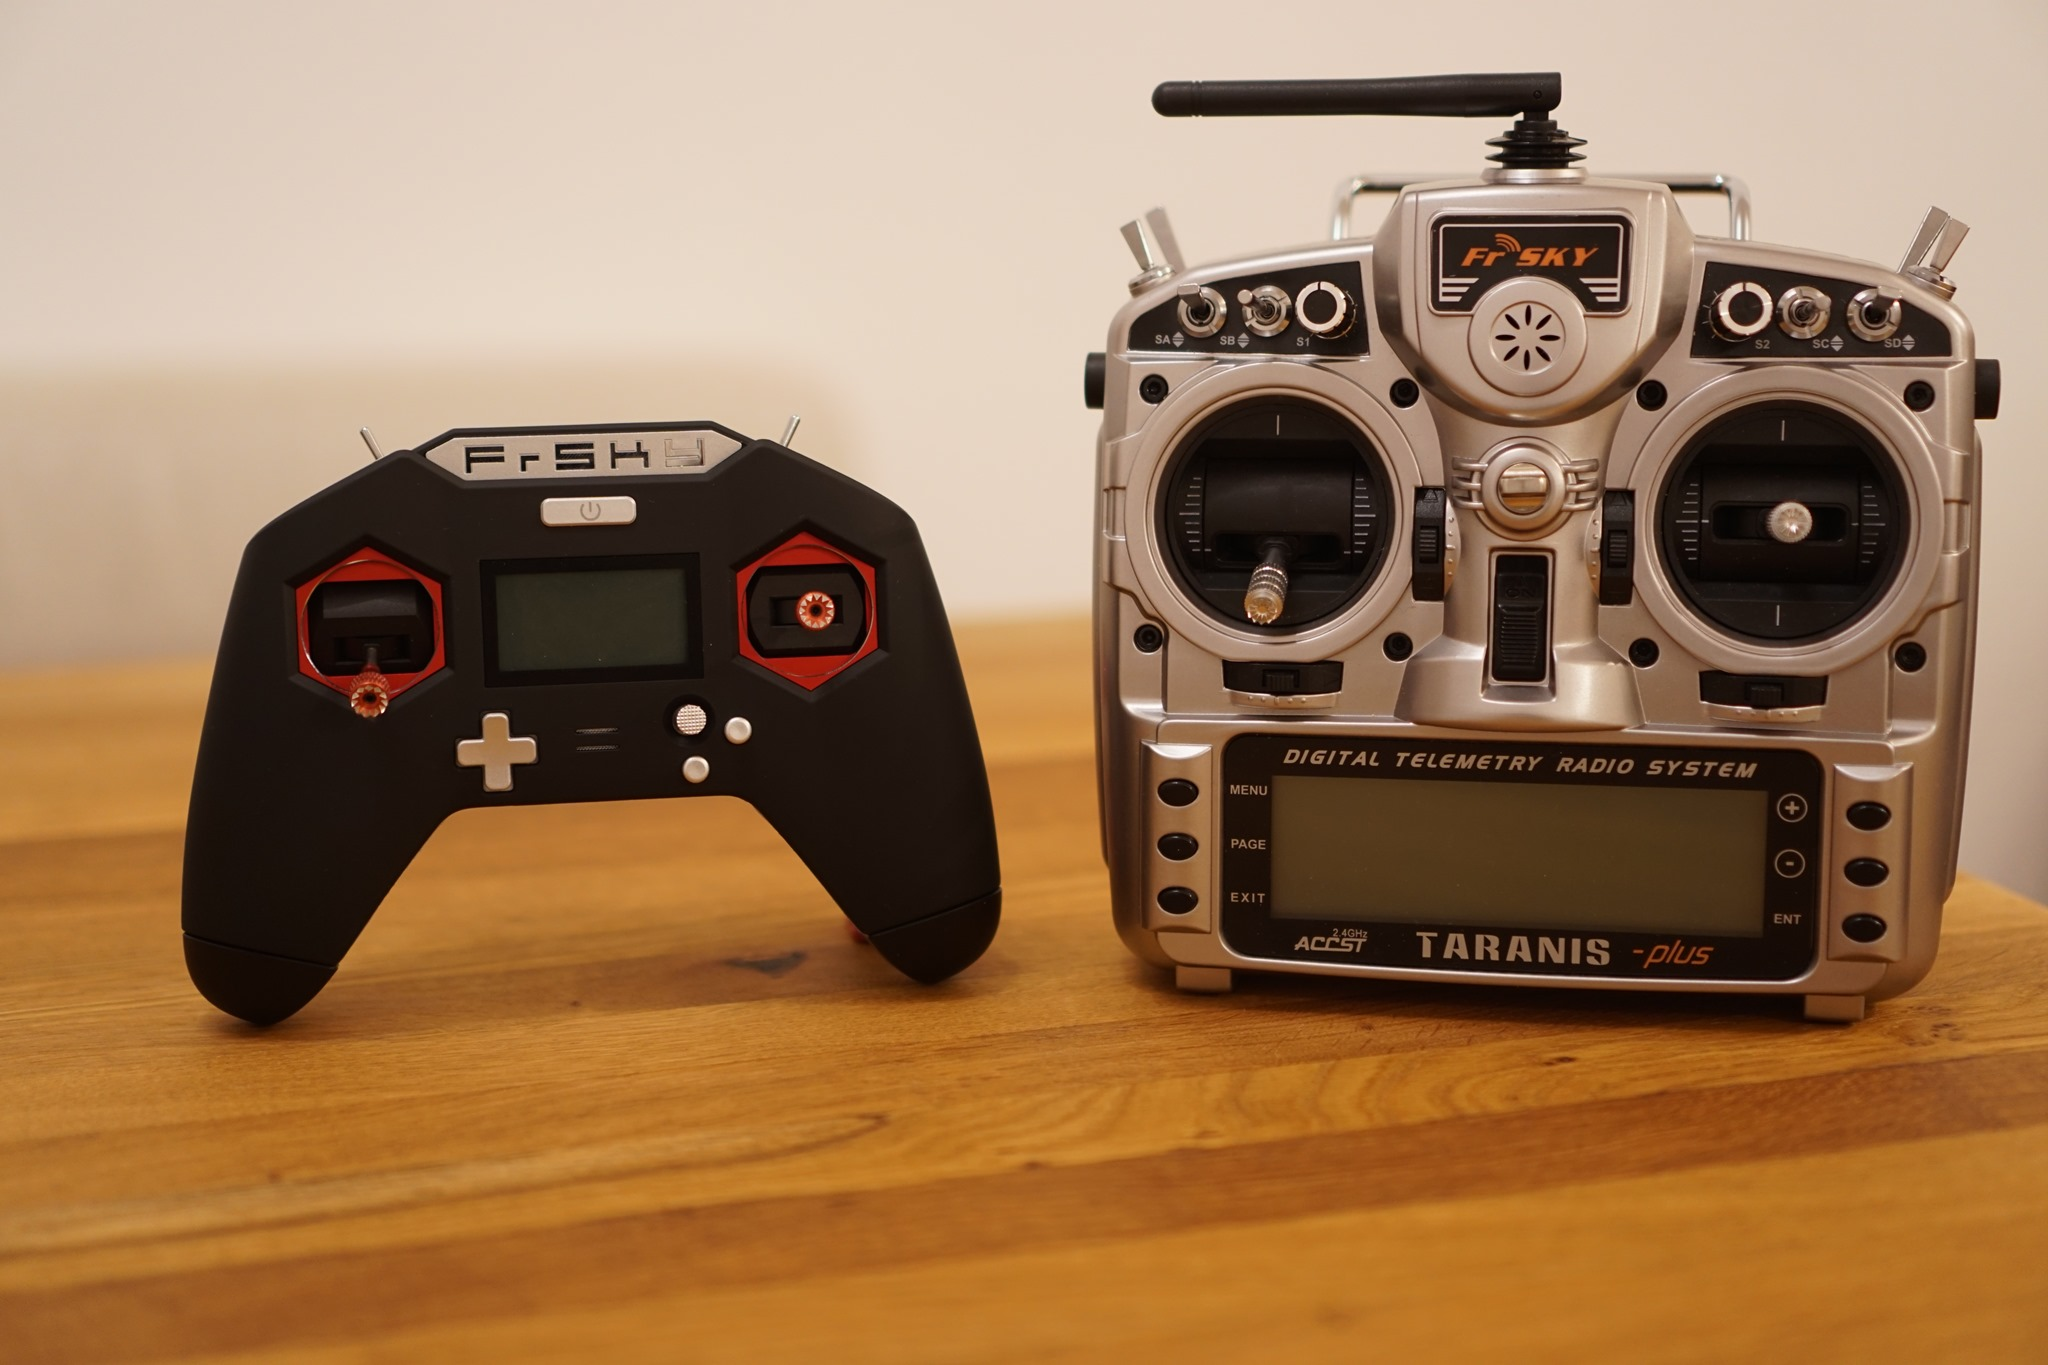 DroneHiTech com – FrSky Taranis X-Lite Transmitter Review